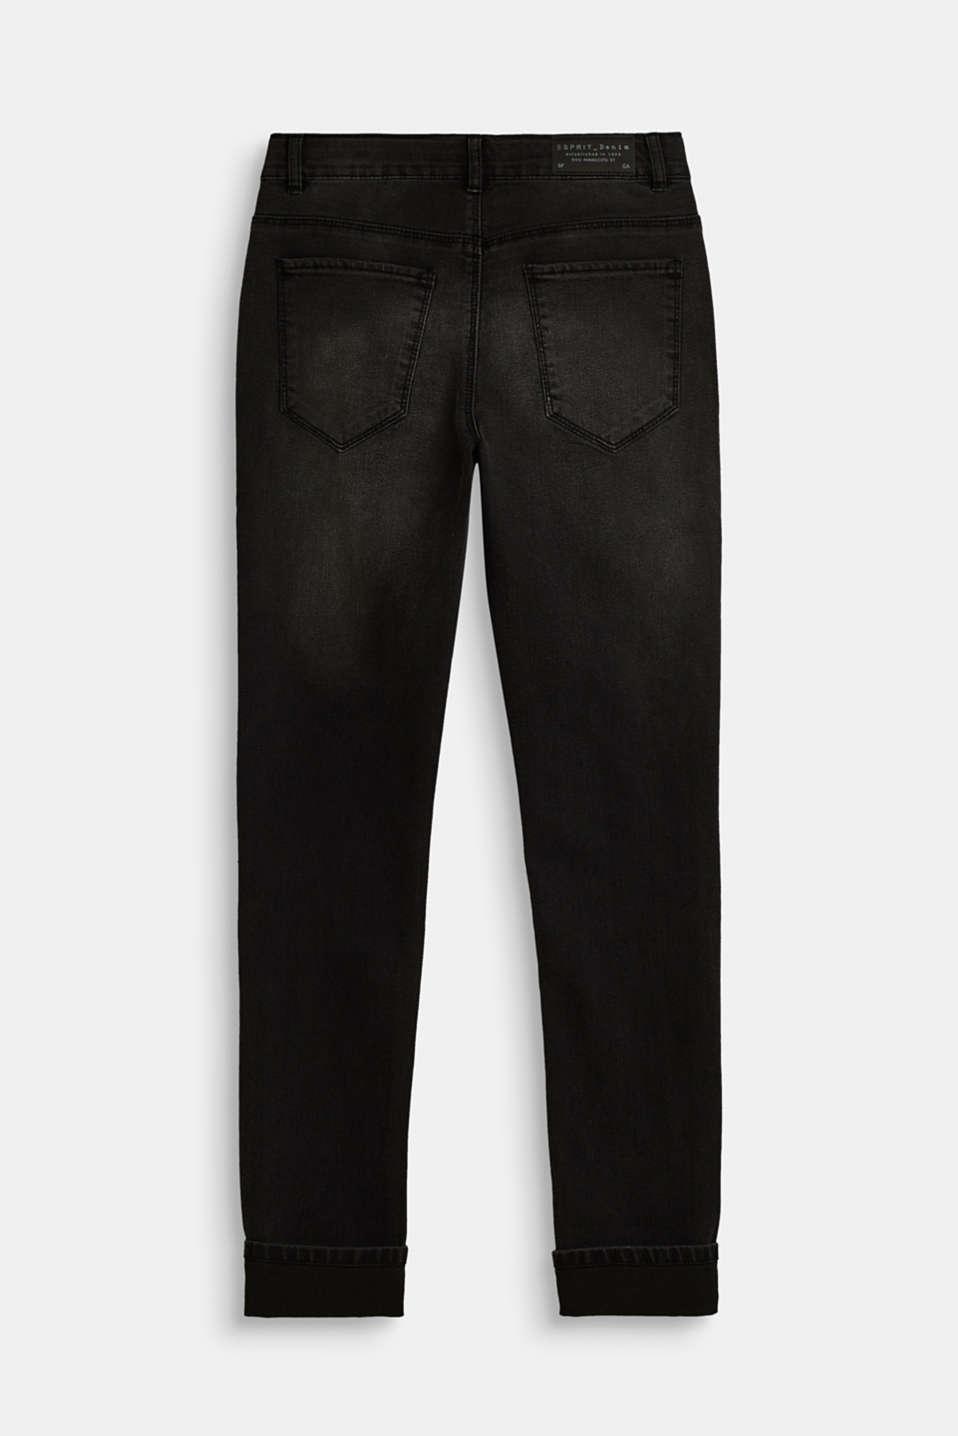 Pants denim, LCBLACK DENIM, detail image number 1